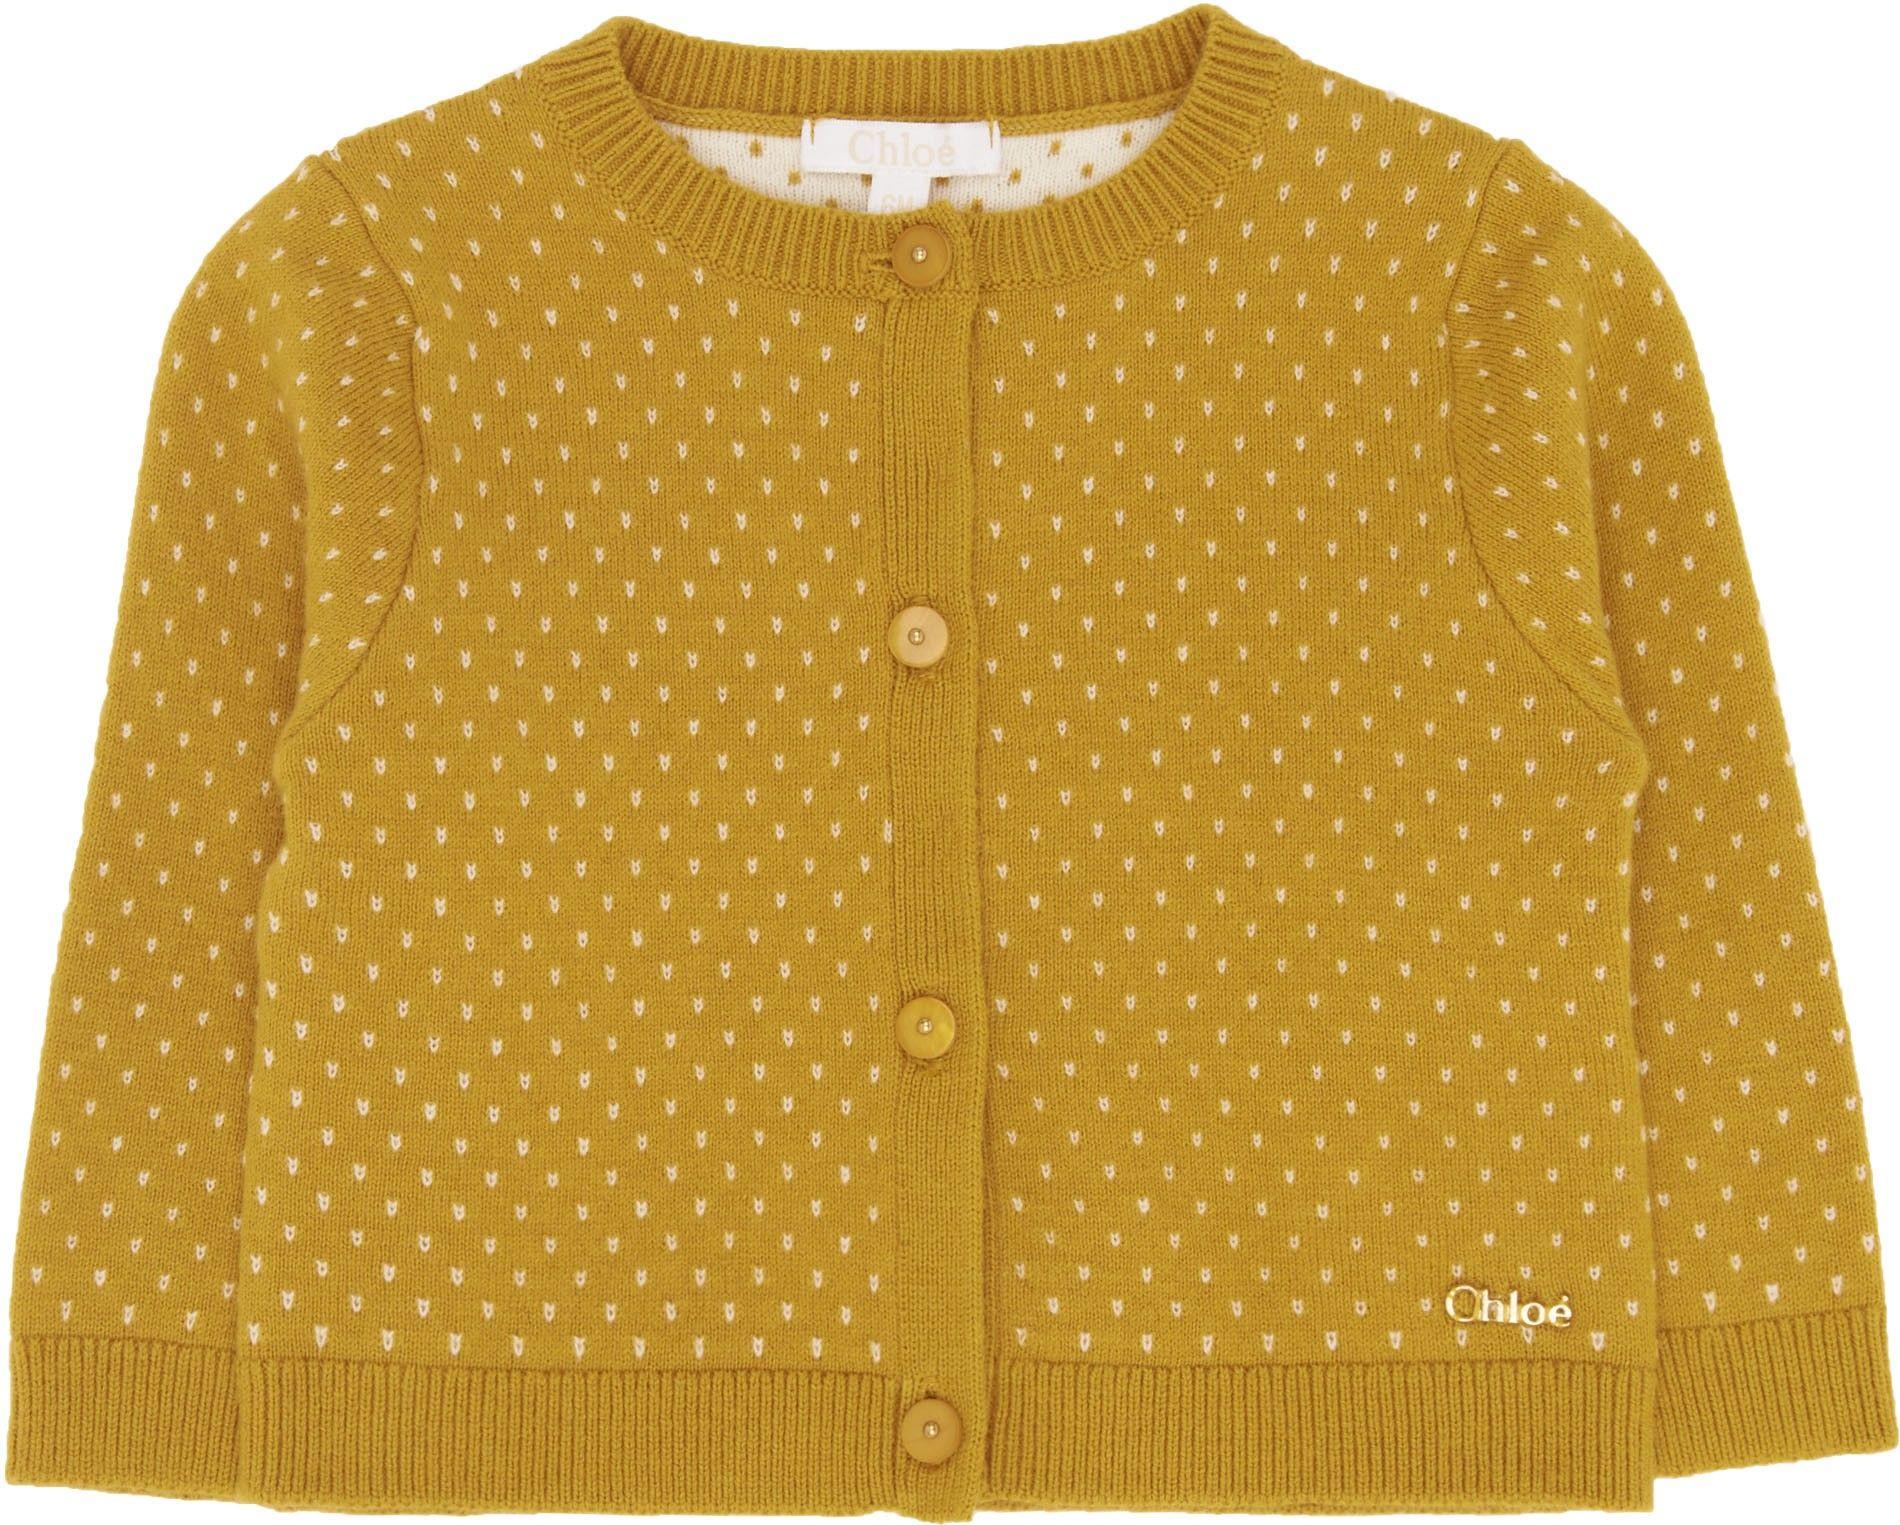 Buy Chloe Girls Reva Baby Cardigan in Yellow at Elias & Grace ...